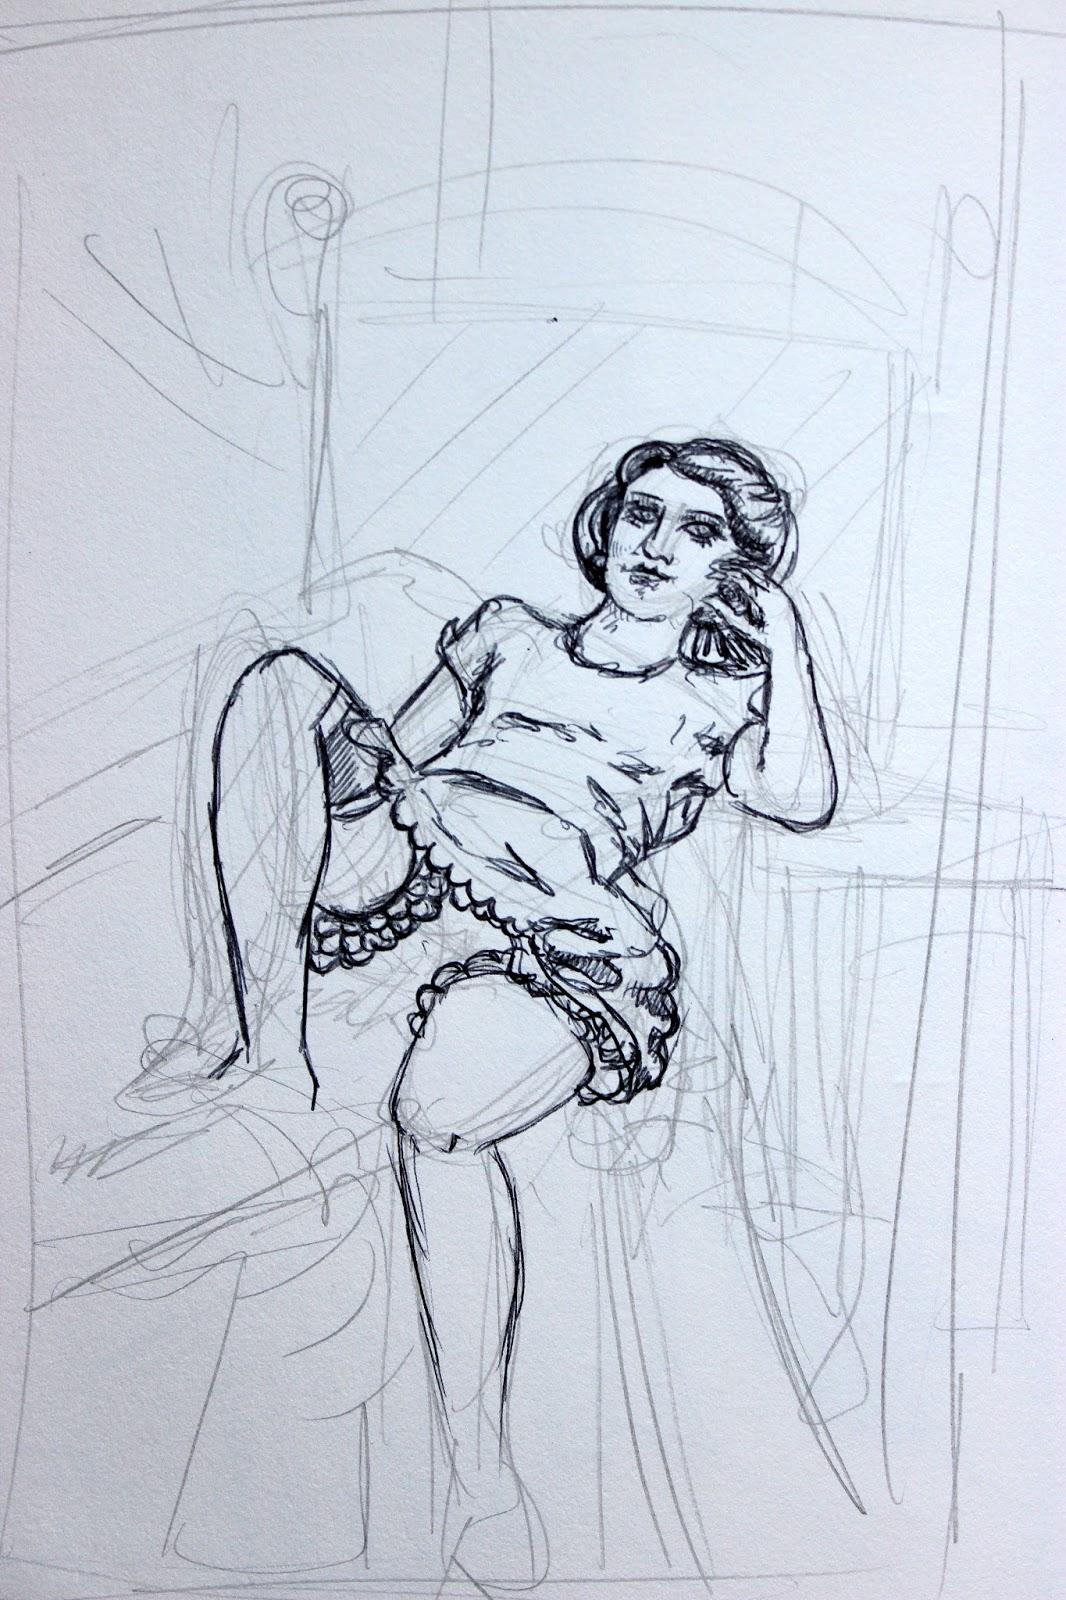 Sketchpad Notebook Sketch Drawing Pencil Pen Girl Knickers